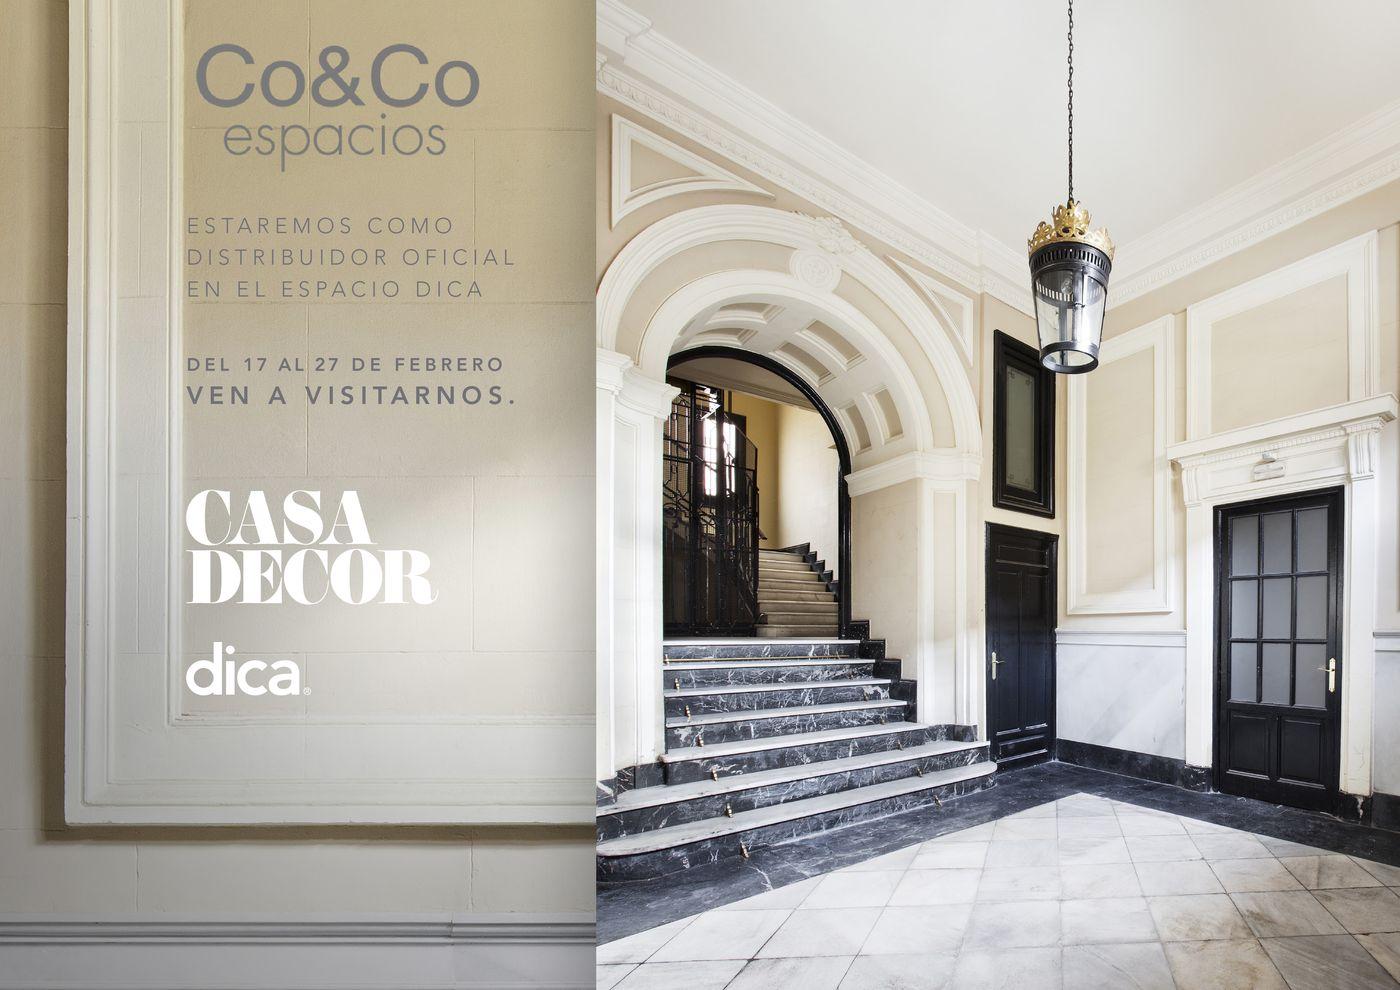 Co&Co Espacios estará presetente en Casa Decor 2018 dica madrid